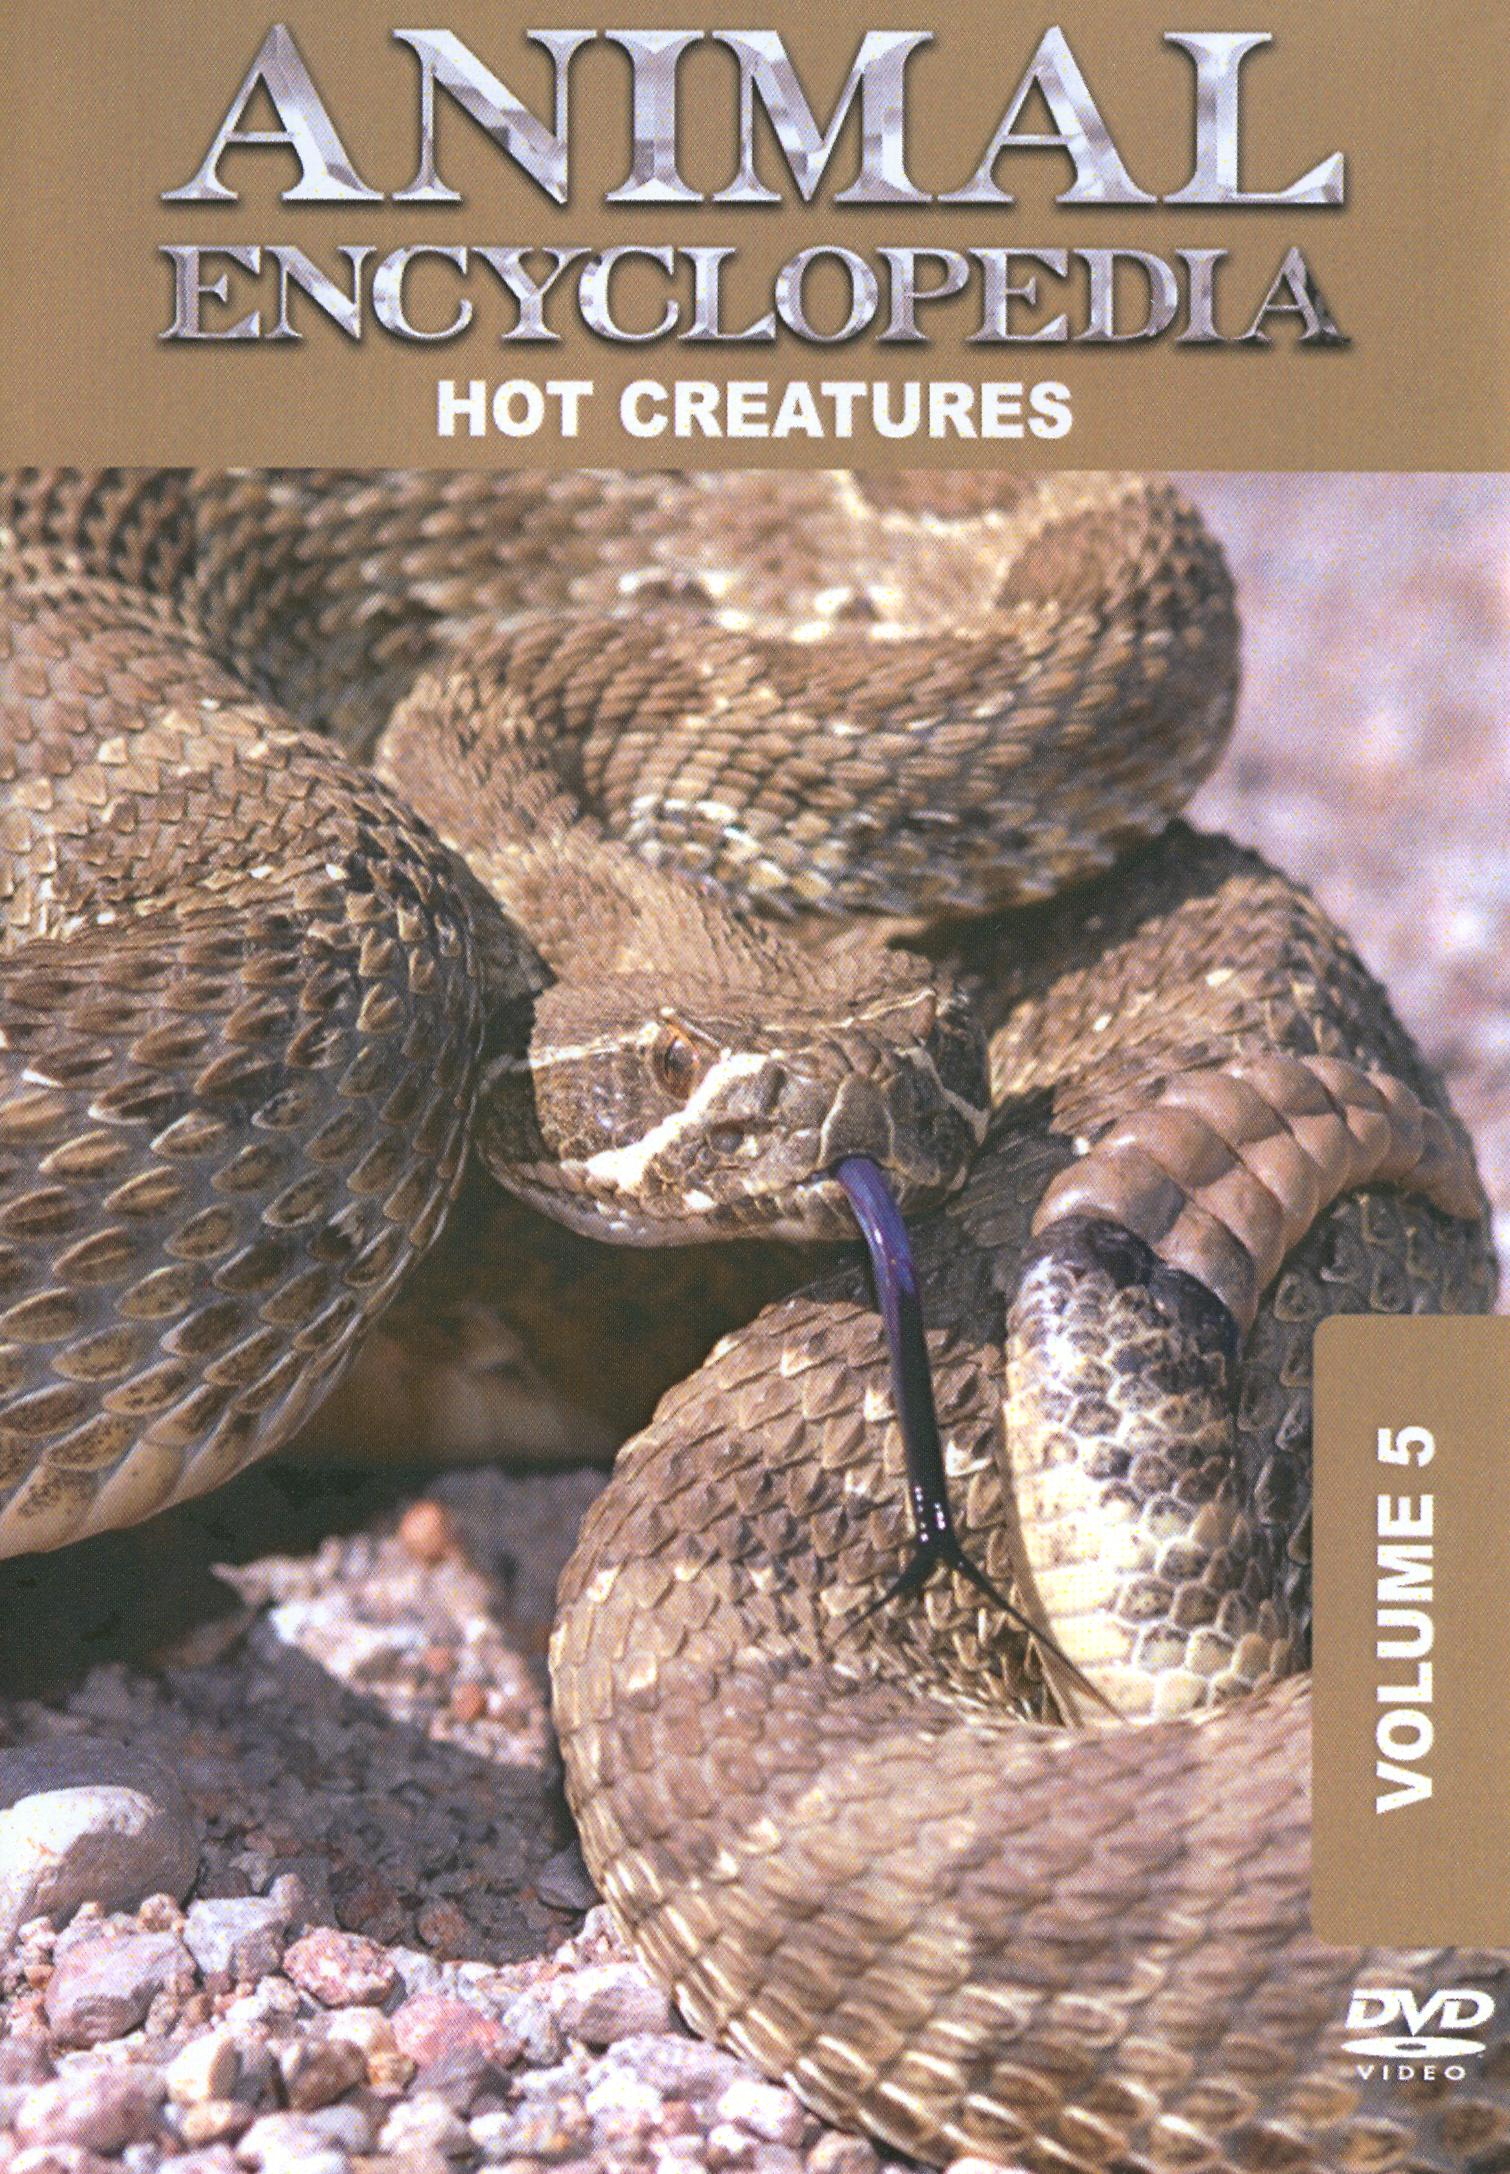 Animal Encyclopedia, Vol. 5: Hot Creatures